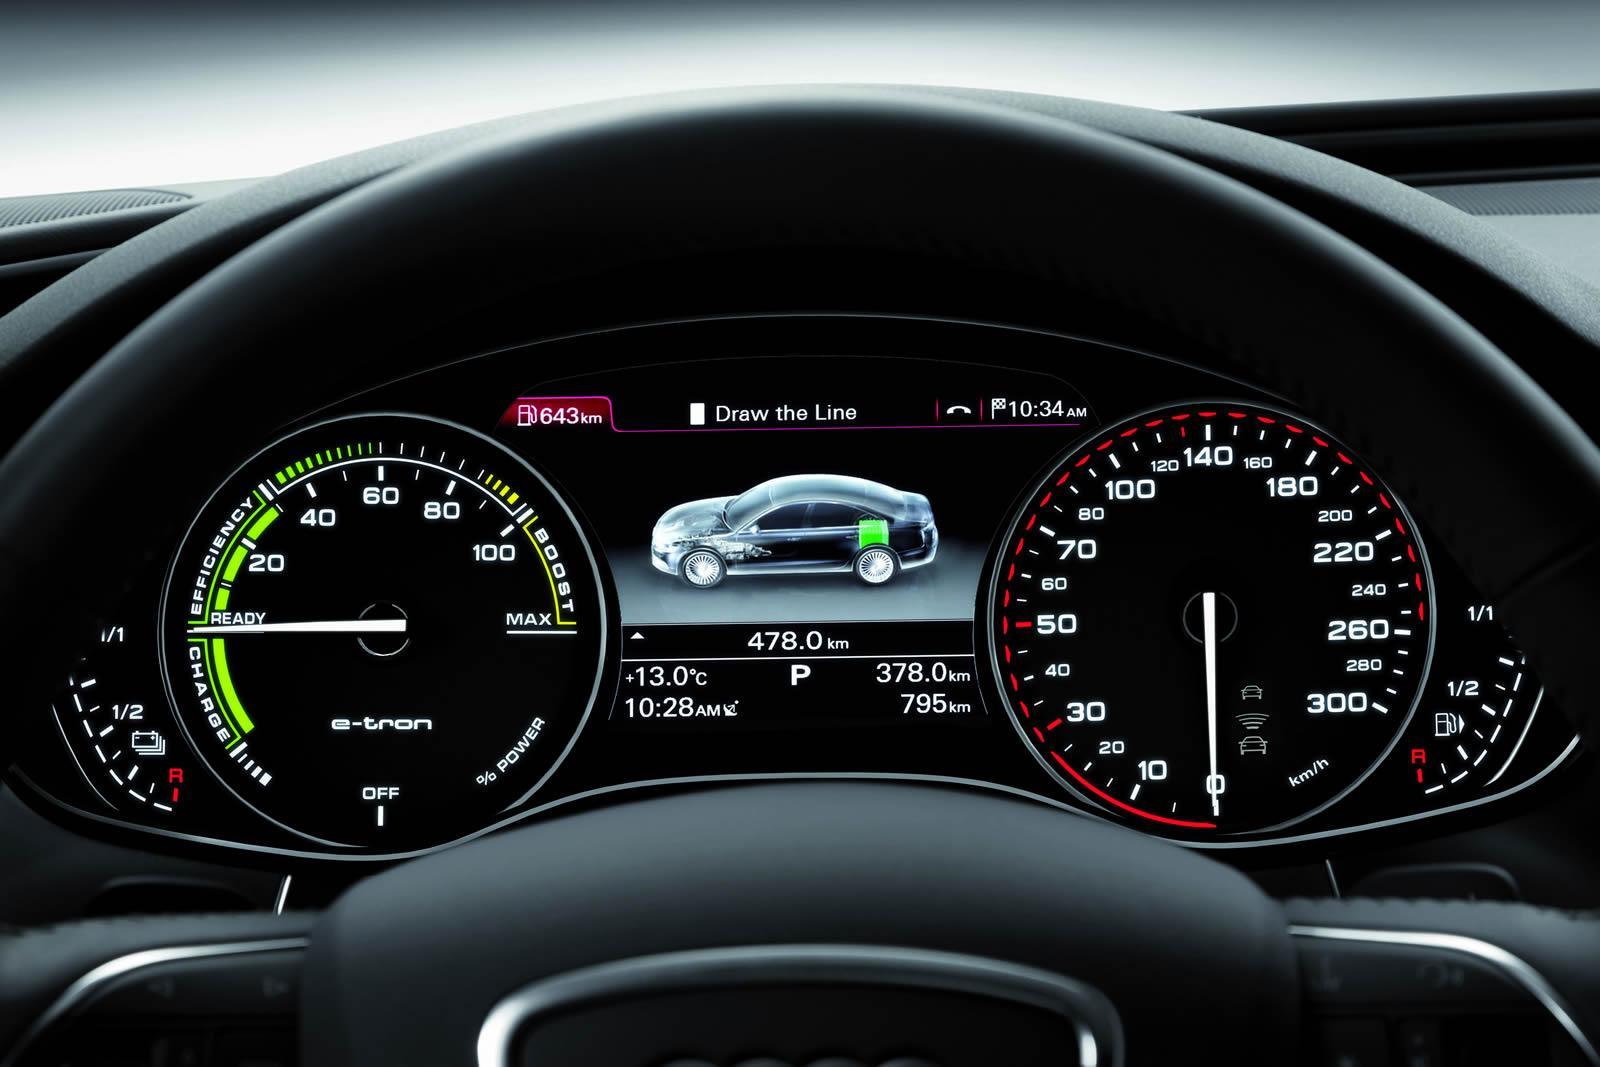 2012 Audi A6 L e-tron Concept Unveiled - Photo Gallery - autoevolution